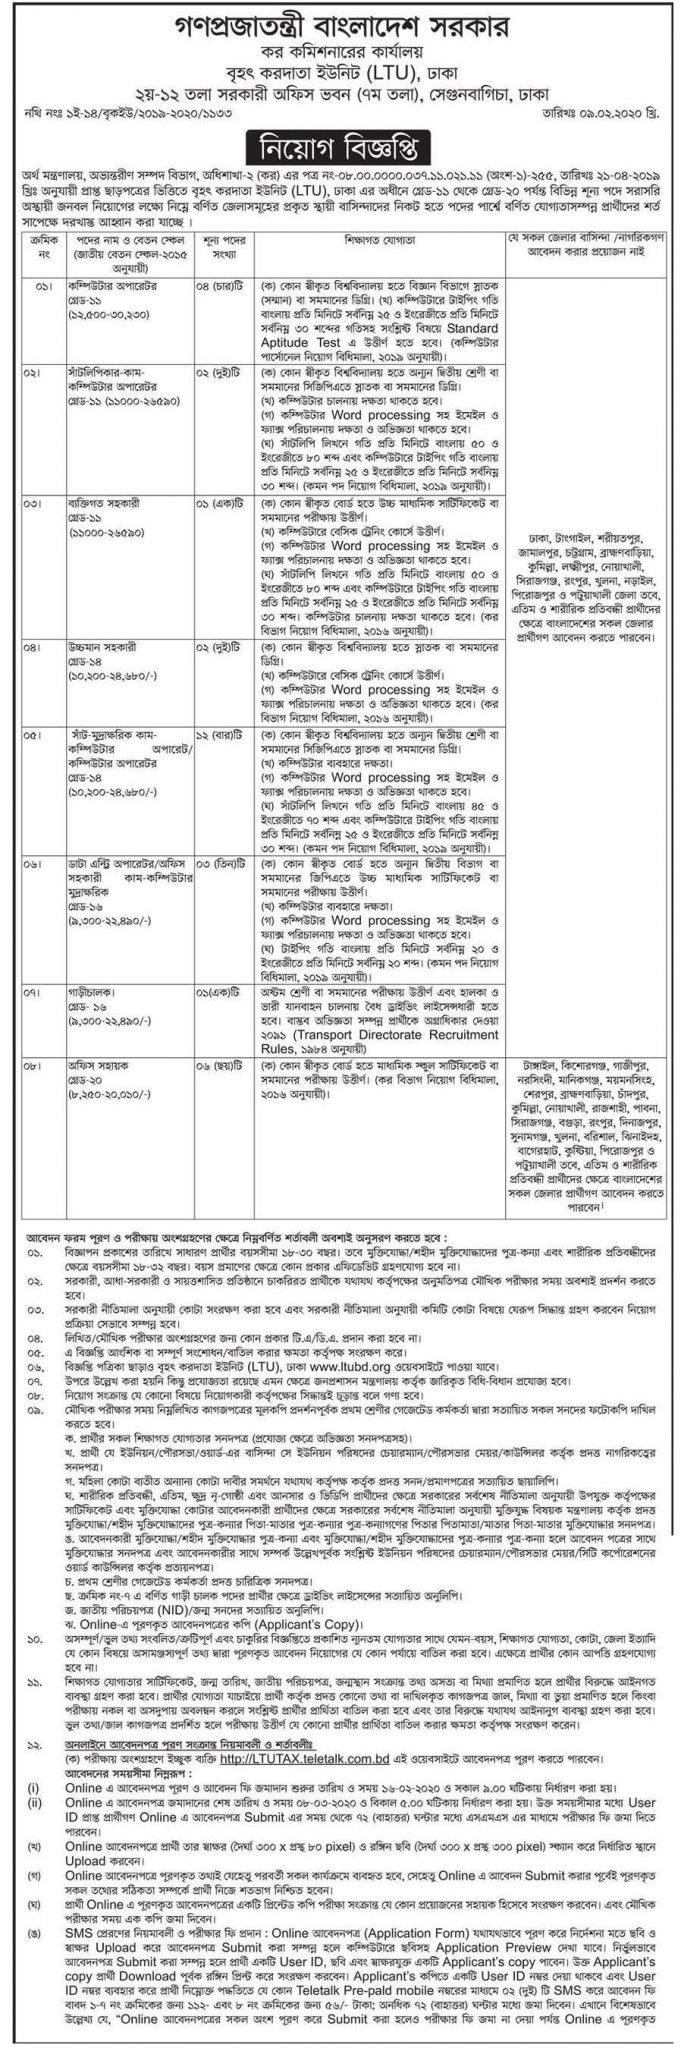 Tax Commissioner Office Job Circular 2020